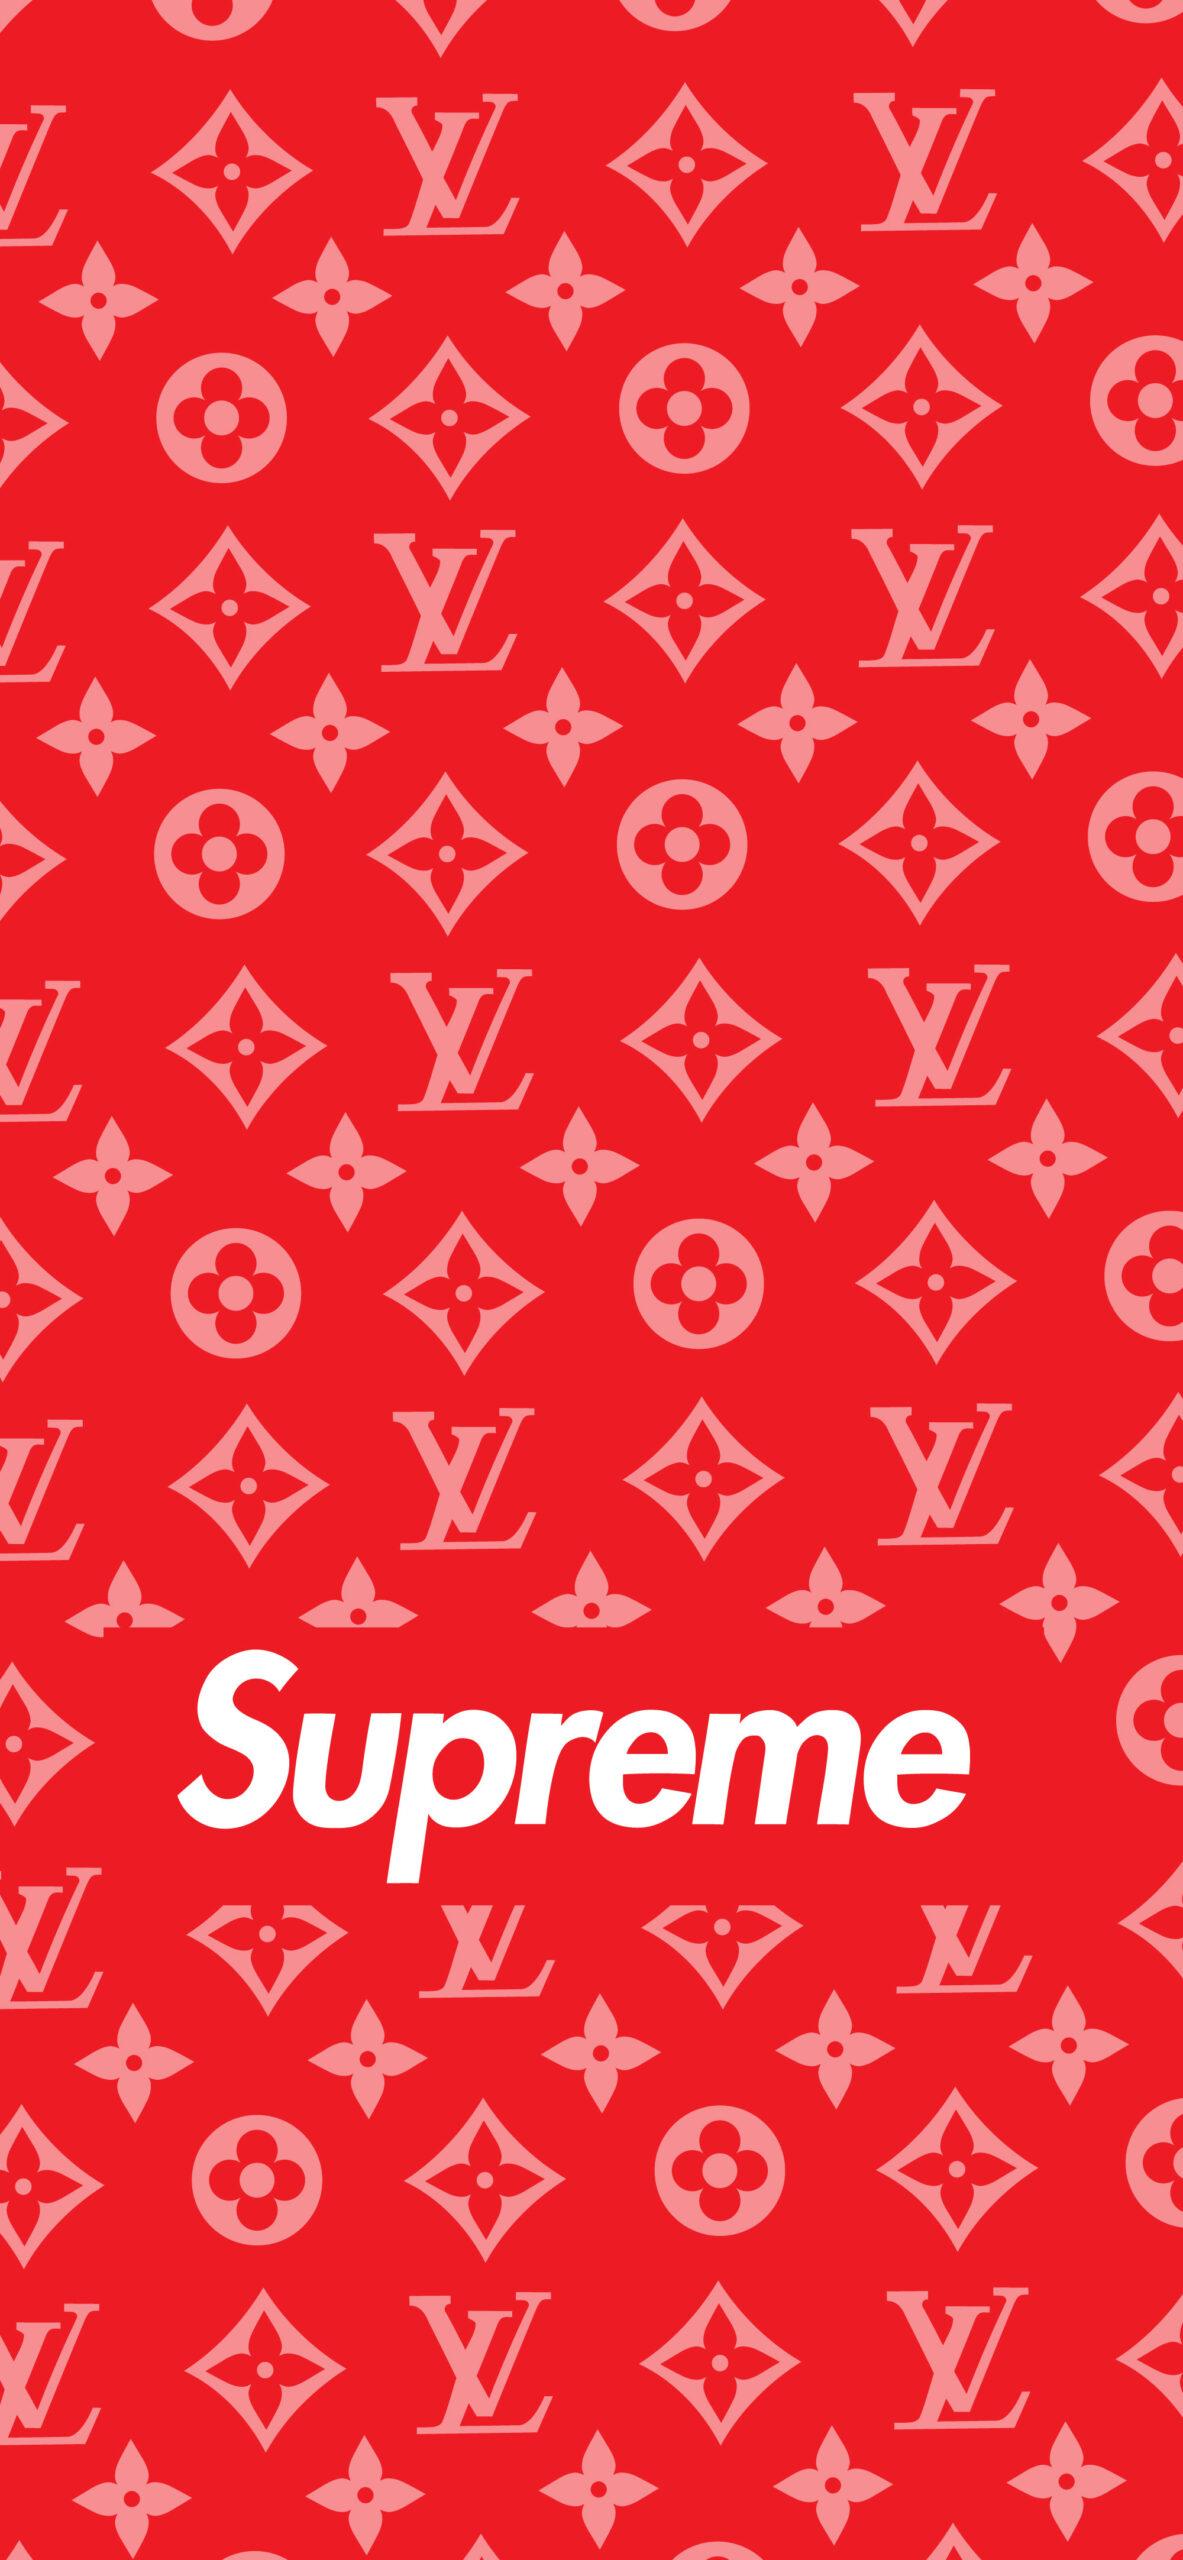 supreme louis vuitton red wallpaper